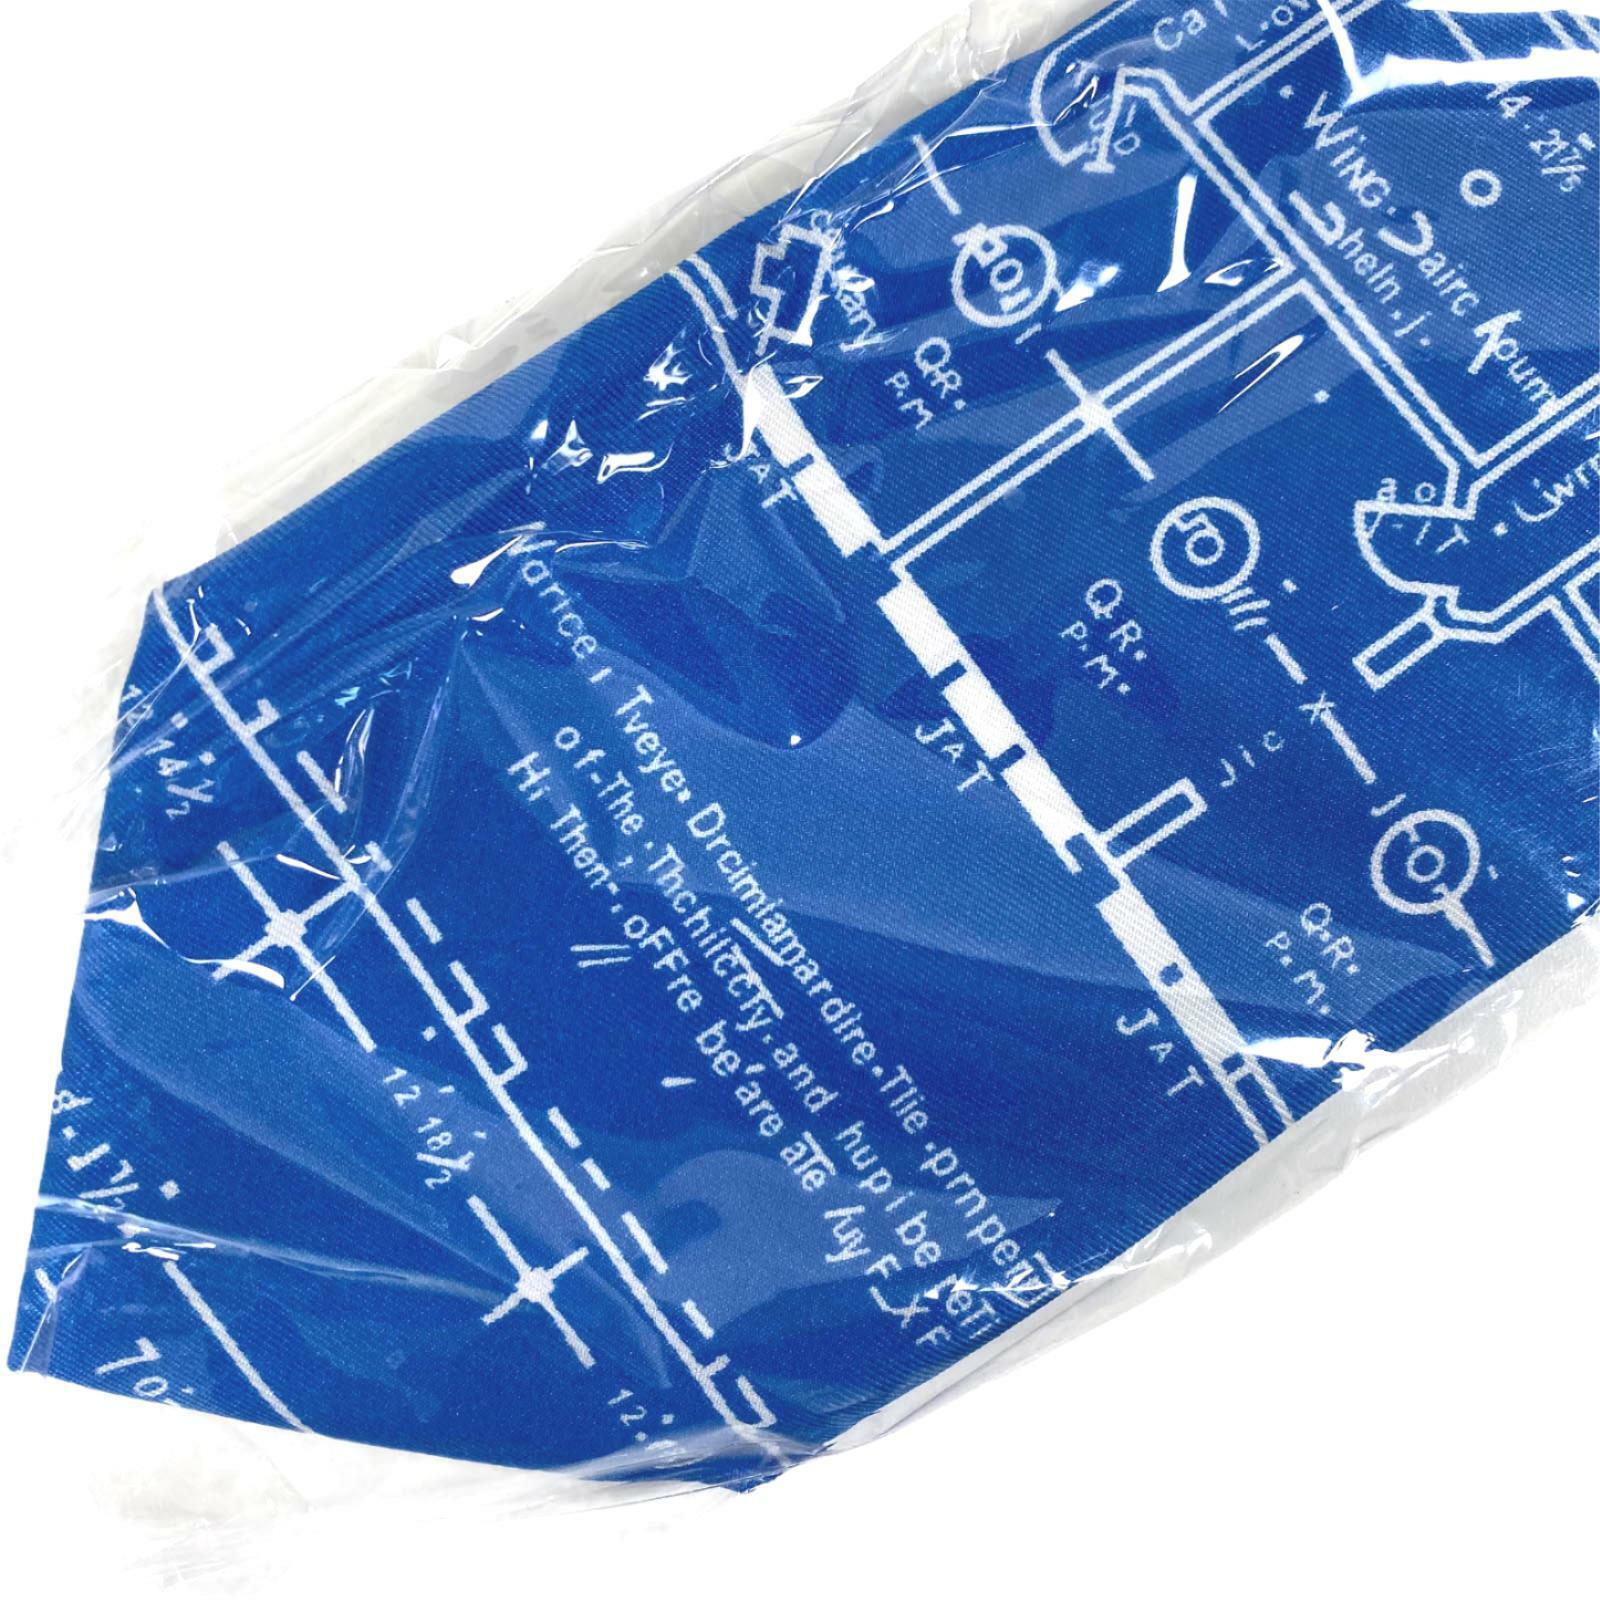 Wild Ties Blau Blueprint Krawatte Nwt